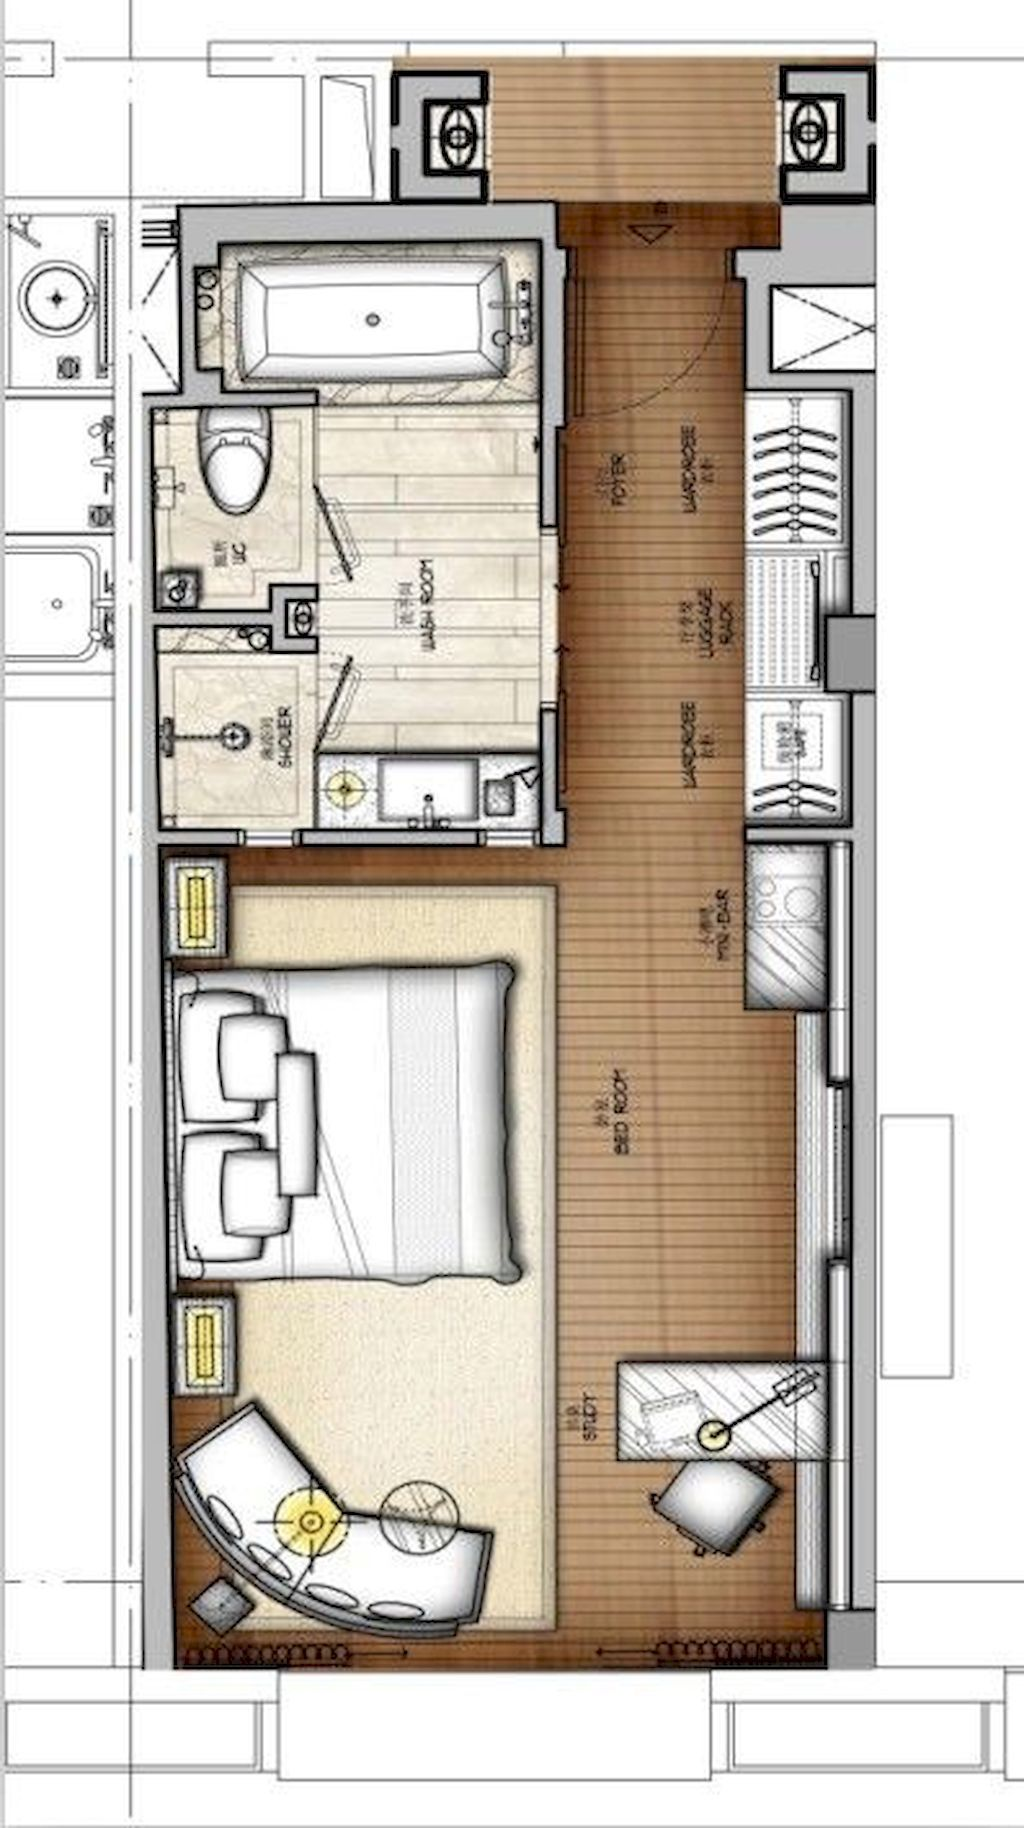 Small Studio Apartment Layout Design Ideas 3 Home Design Hotel Floor Plan Hotel Room Design Hotel Room Plan